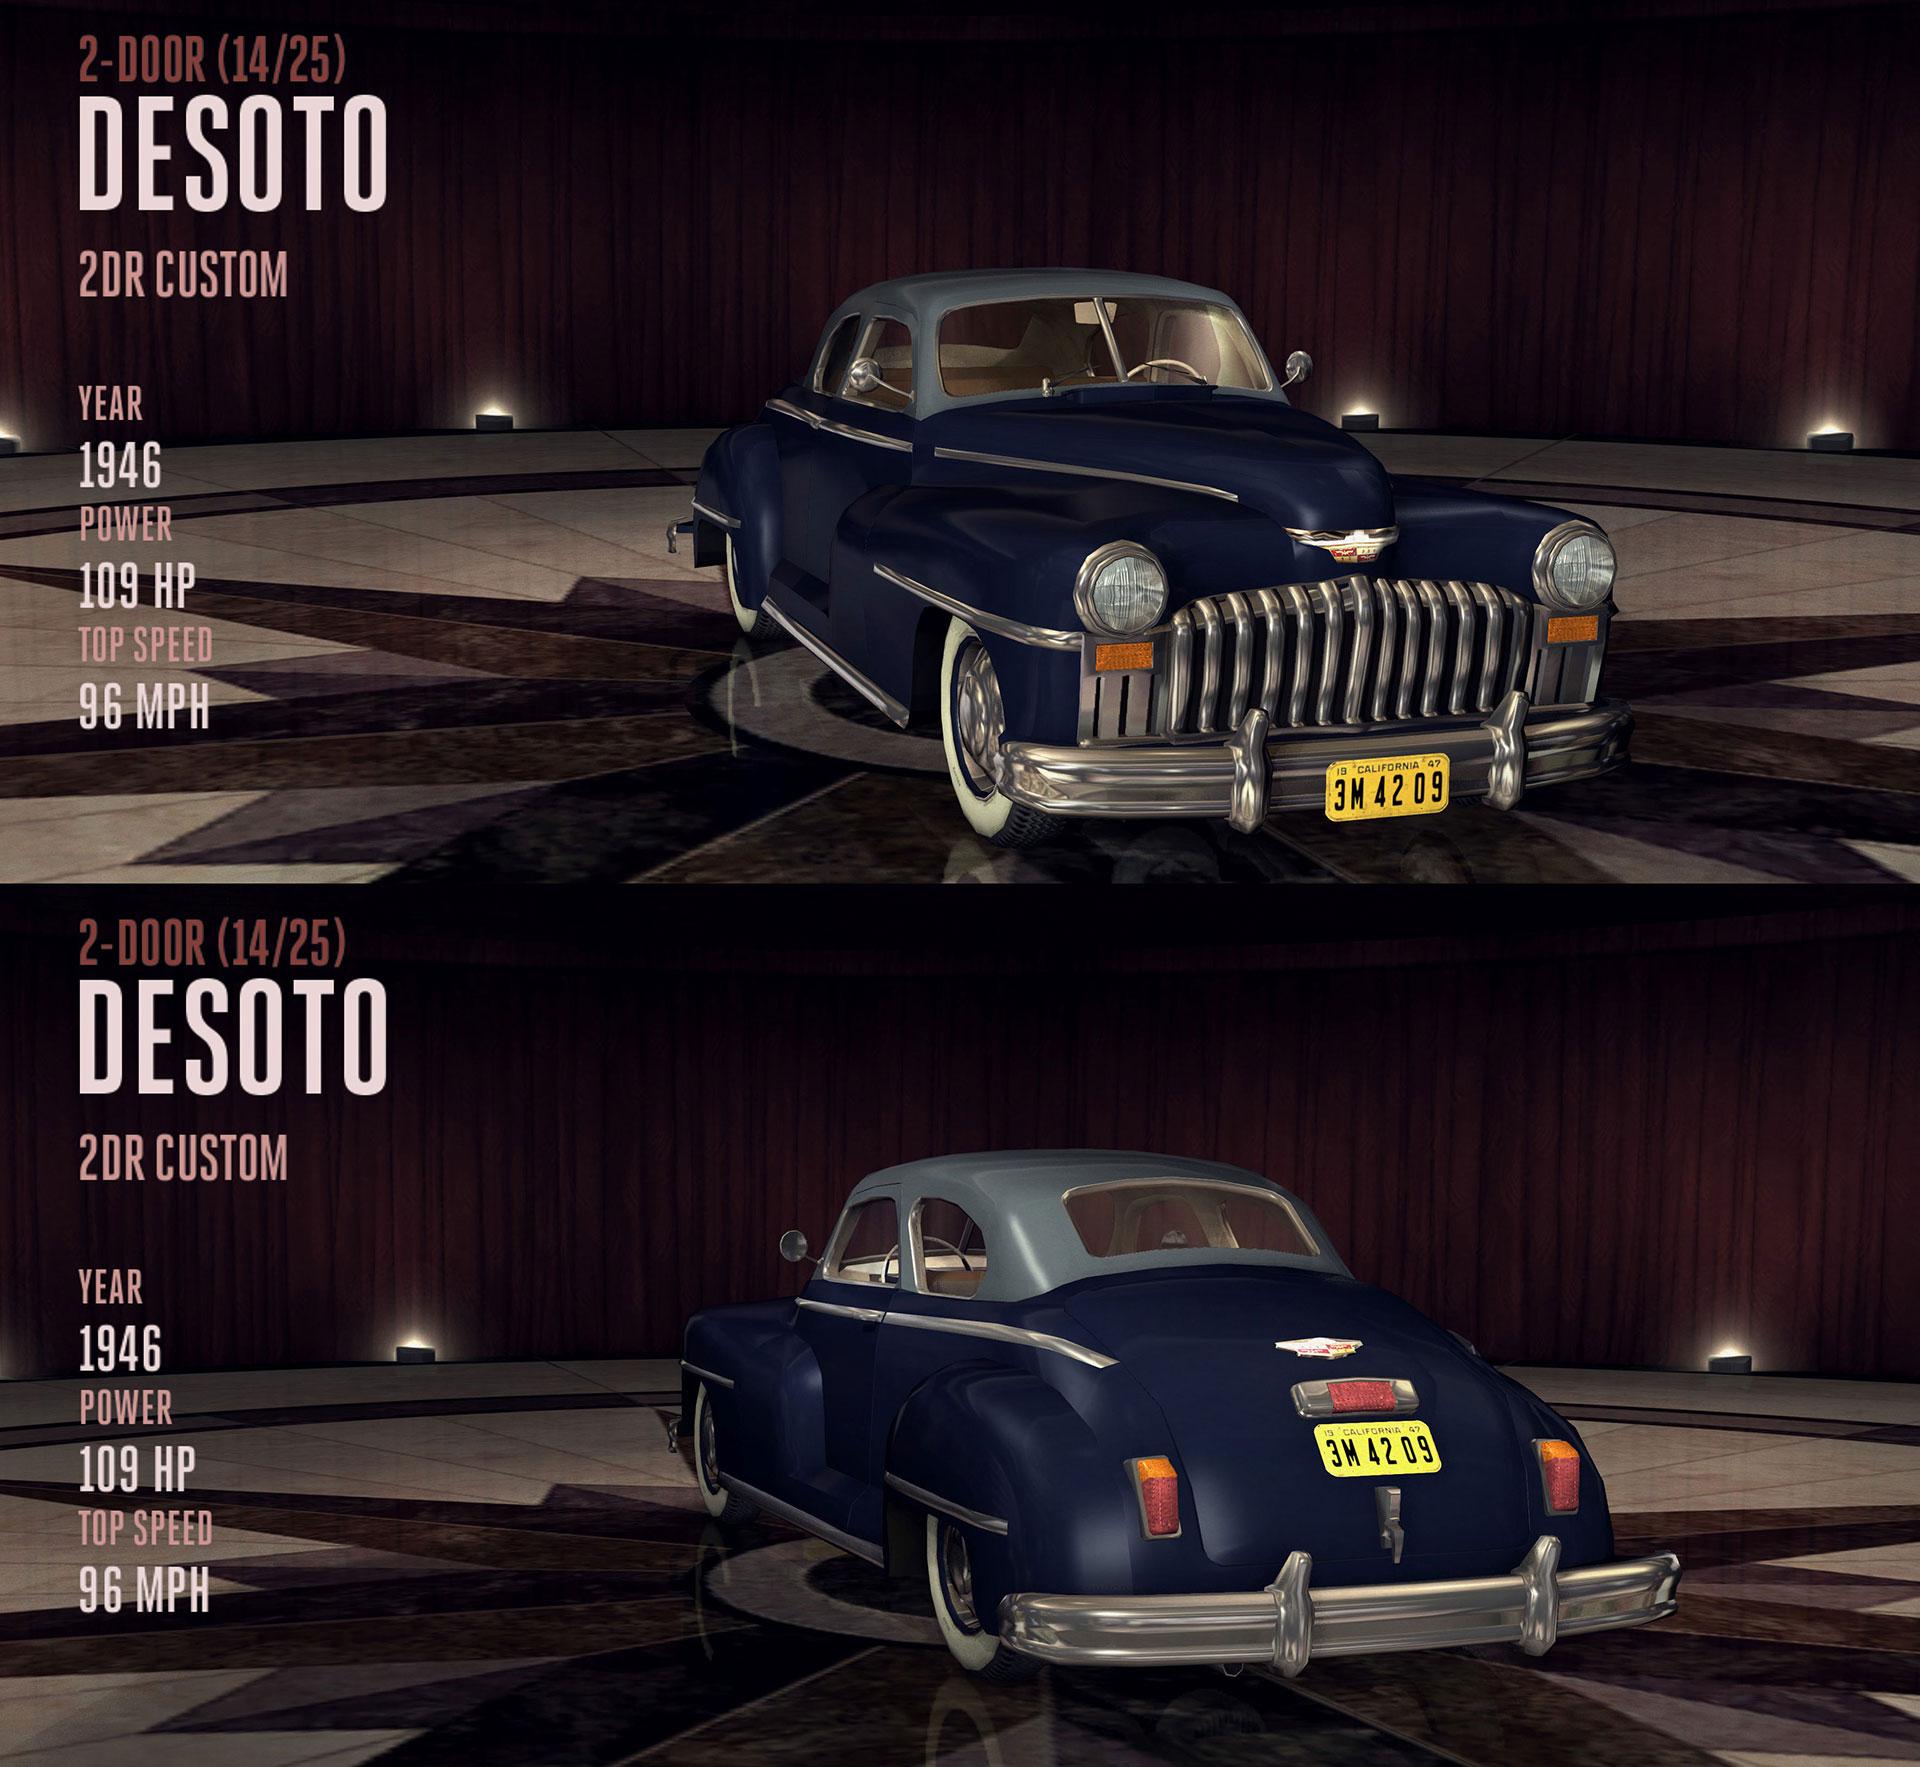 DeSoto 2DR Custom